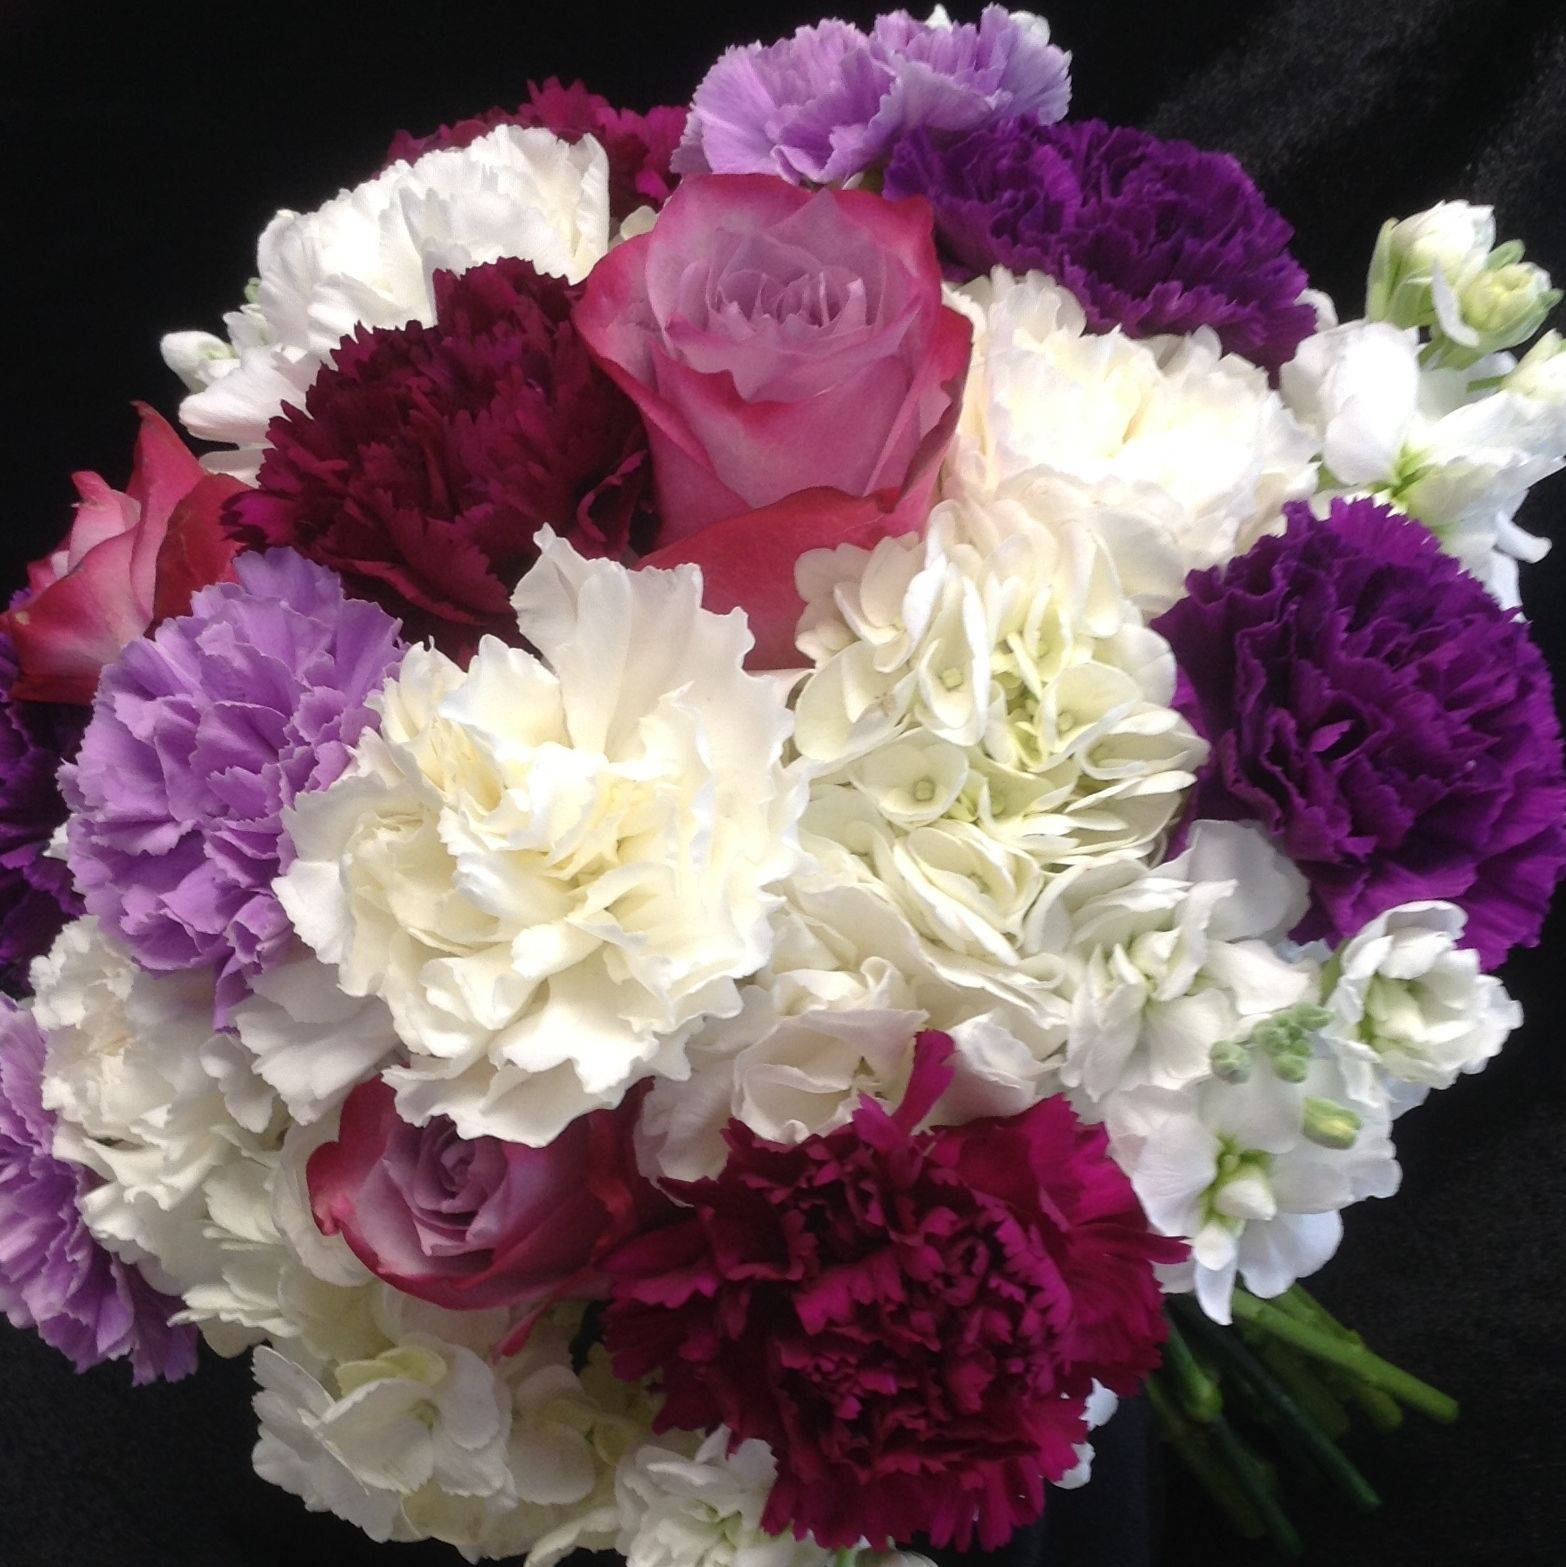 Hydrangea Carnation And Rose Bouquet Wedding Bouquets Wedding Flowers Rose Bouquet